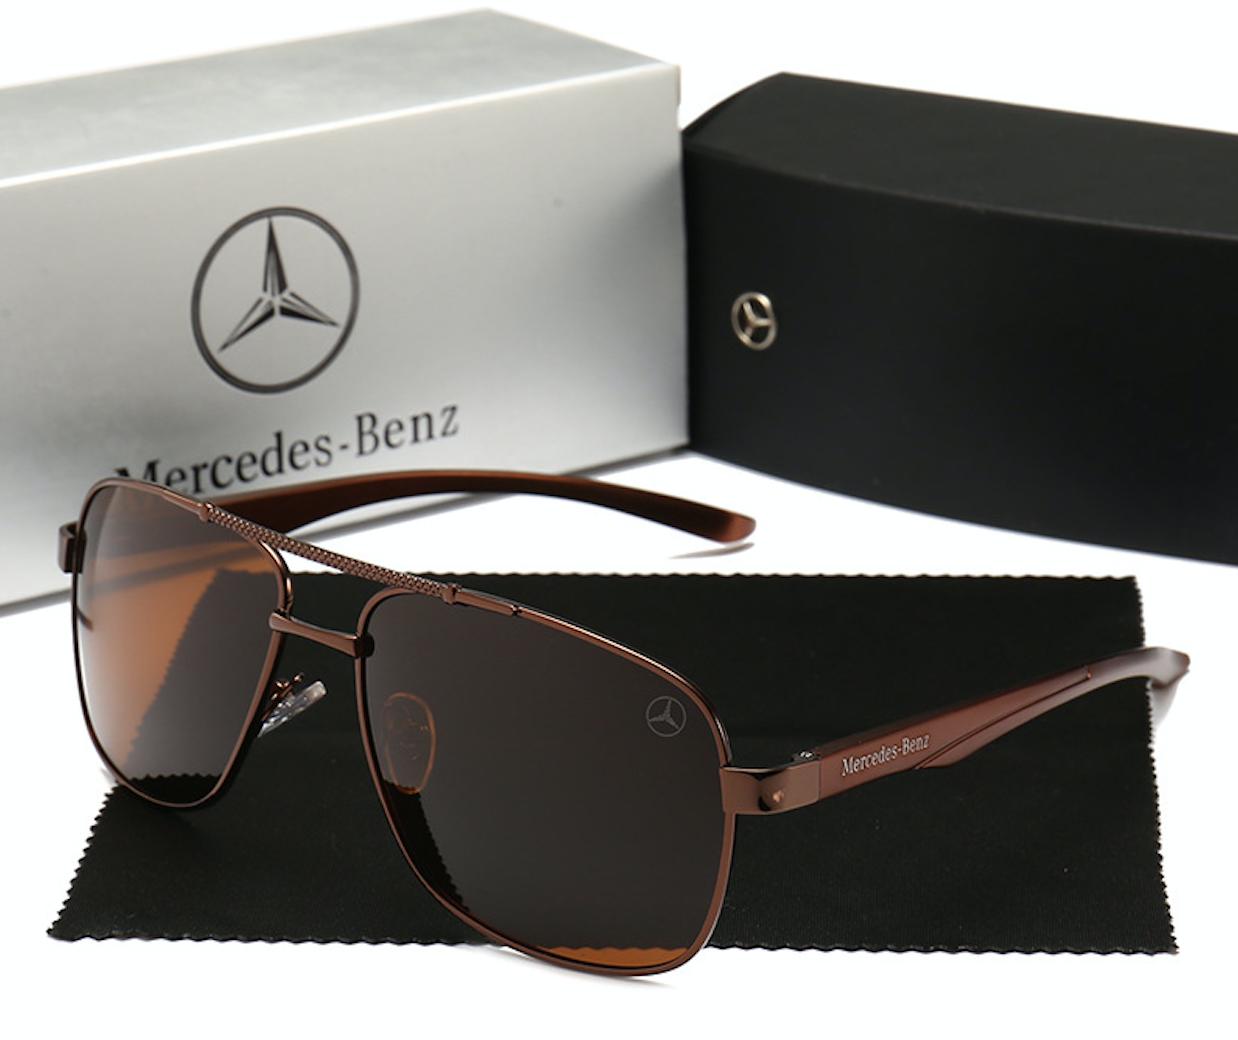 Mercedes Benz AMG NEW Sunglasses Accessories Car Fashion Fashion Fashion Designer Outdoor Sports  | Online einkaufen  62ce3e